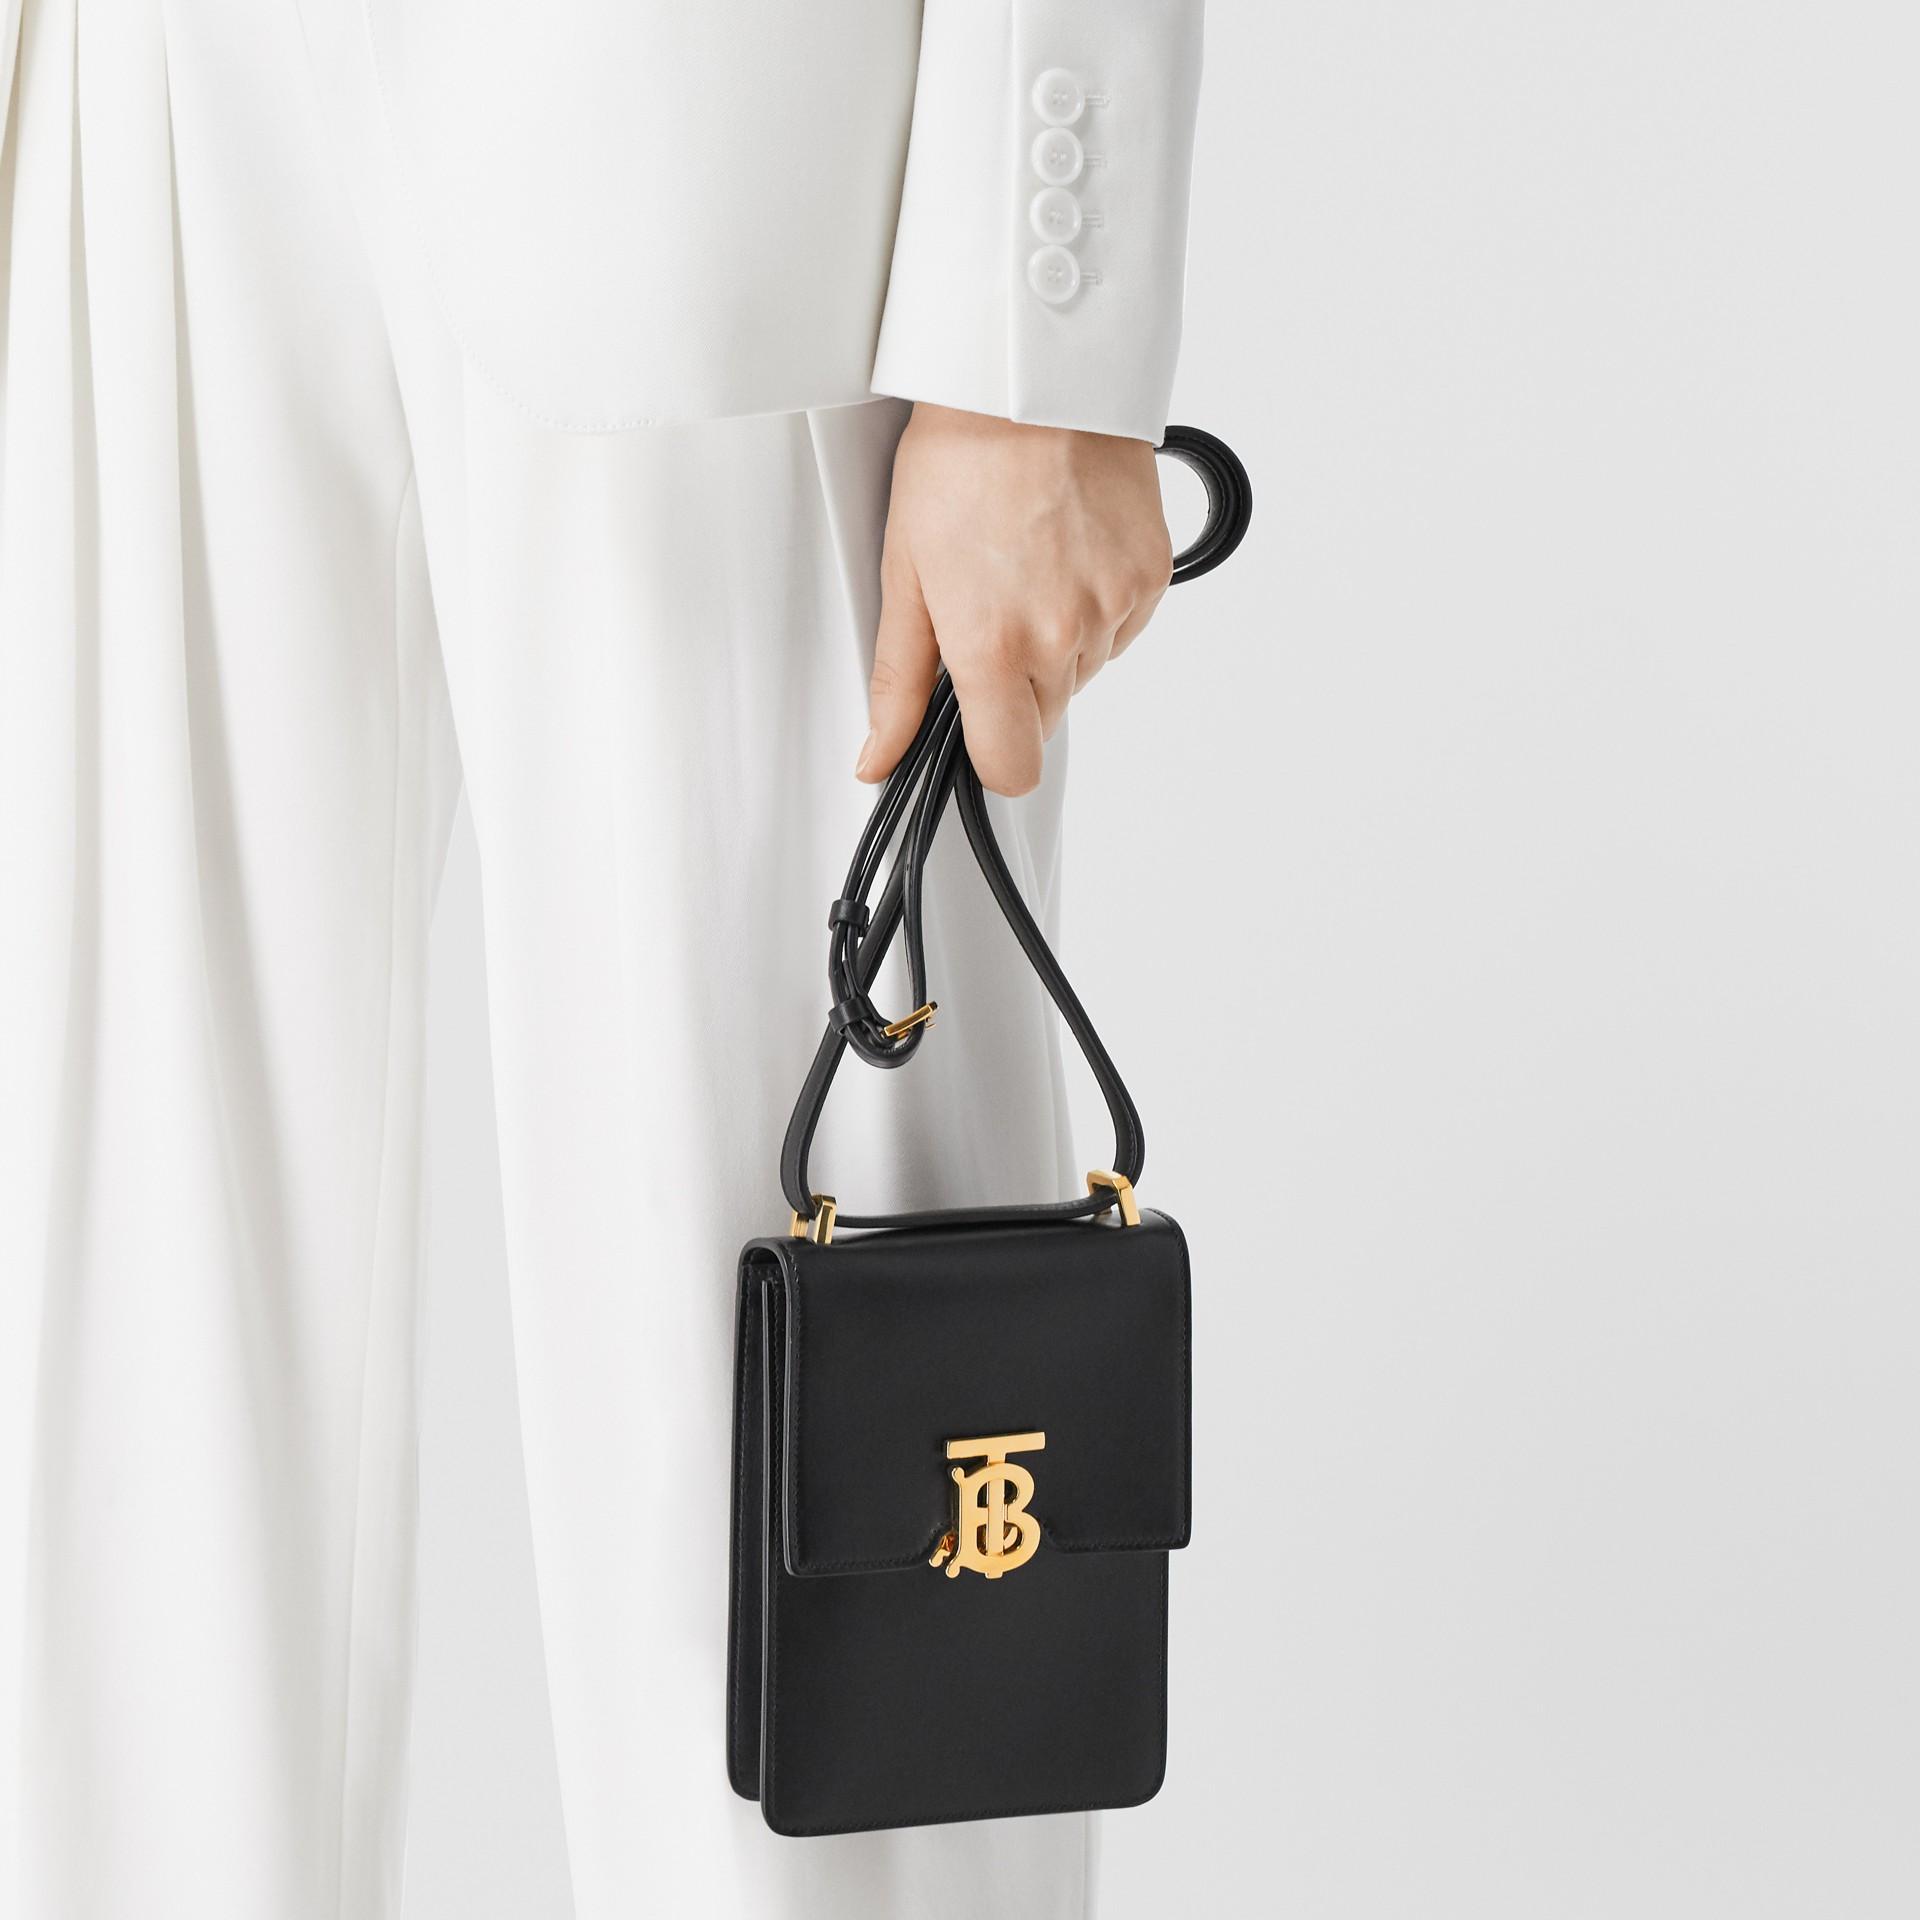 Leather Robin Bag in Black - Women | Burberry Australia - gallery image 2